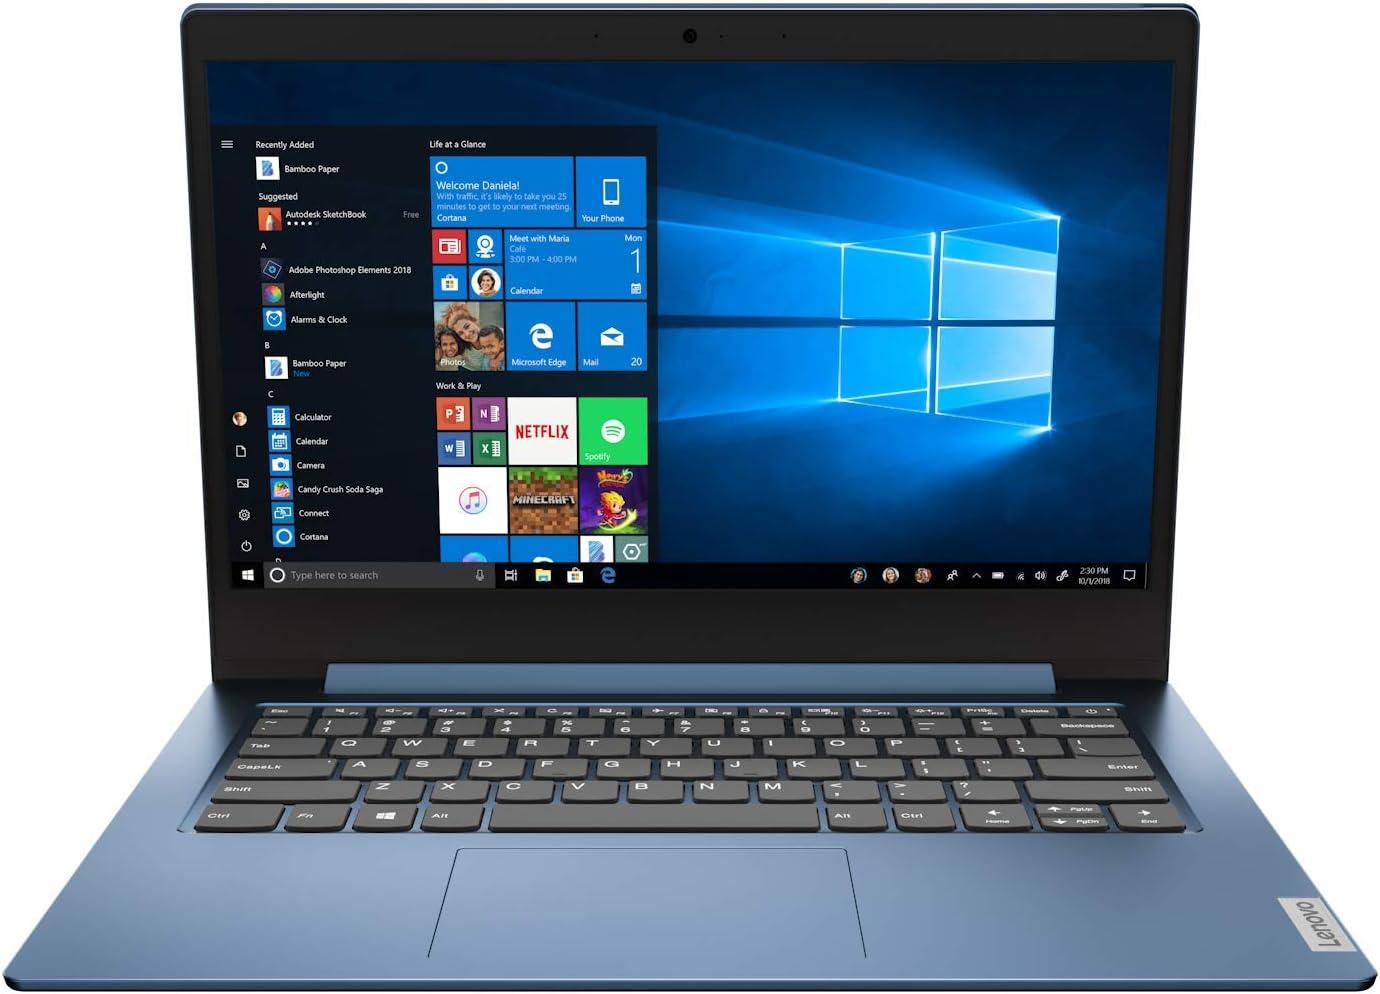 PC per smart working Lenovo IdeaPad Slim 1 Notebook